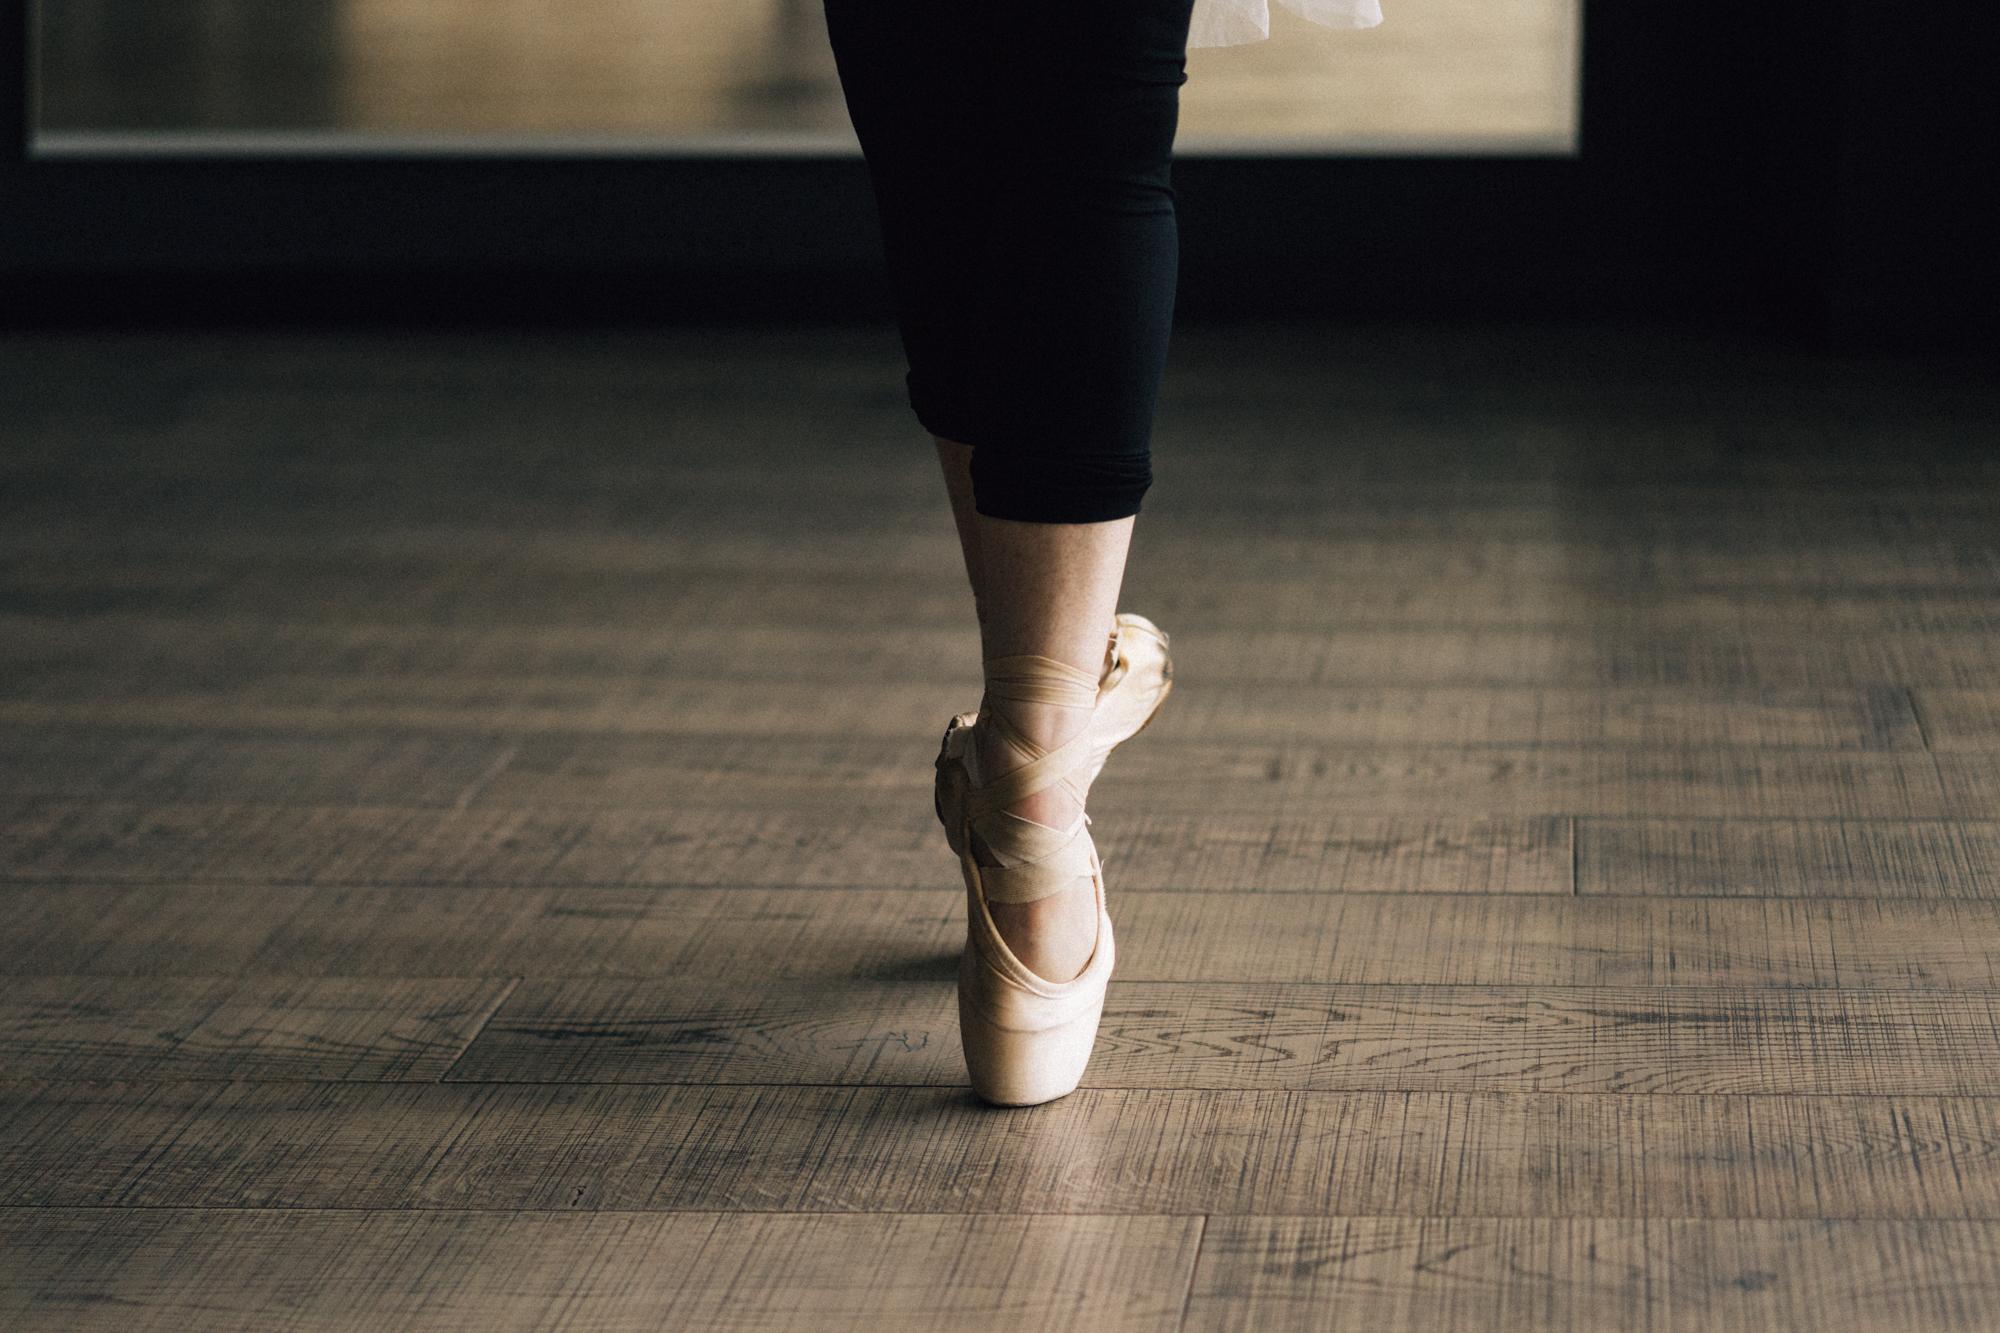 dettaglio punte ballerina